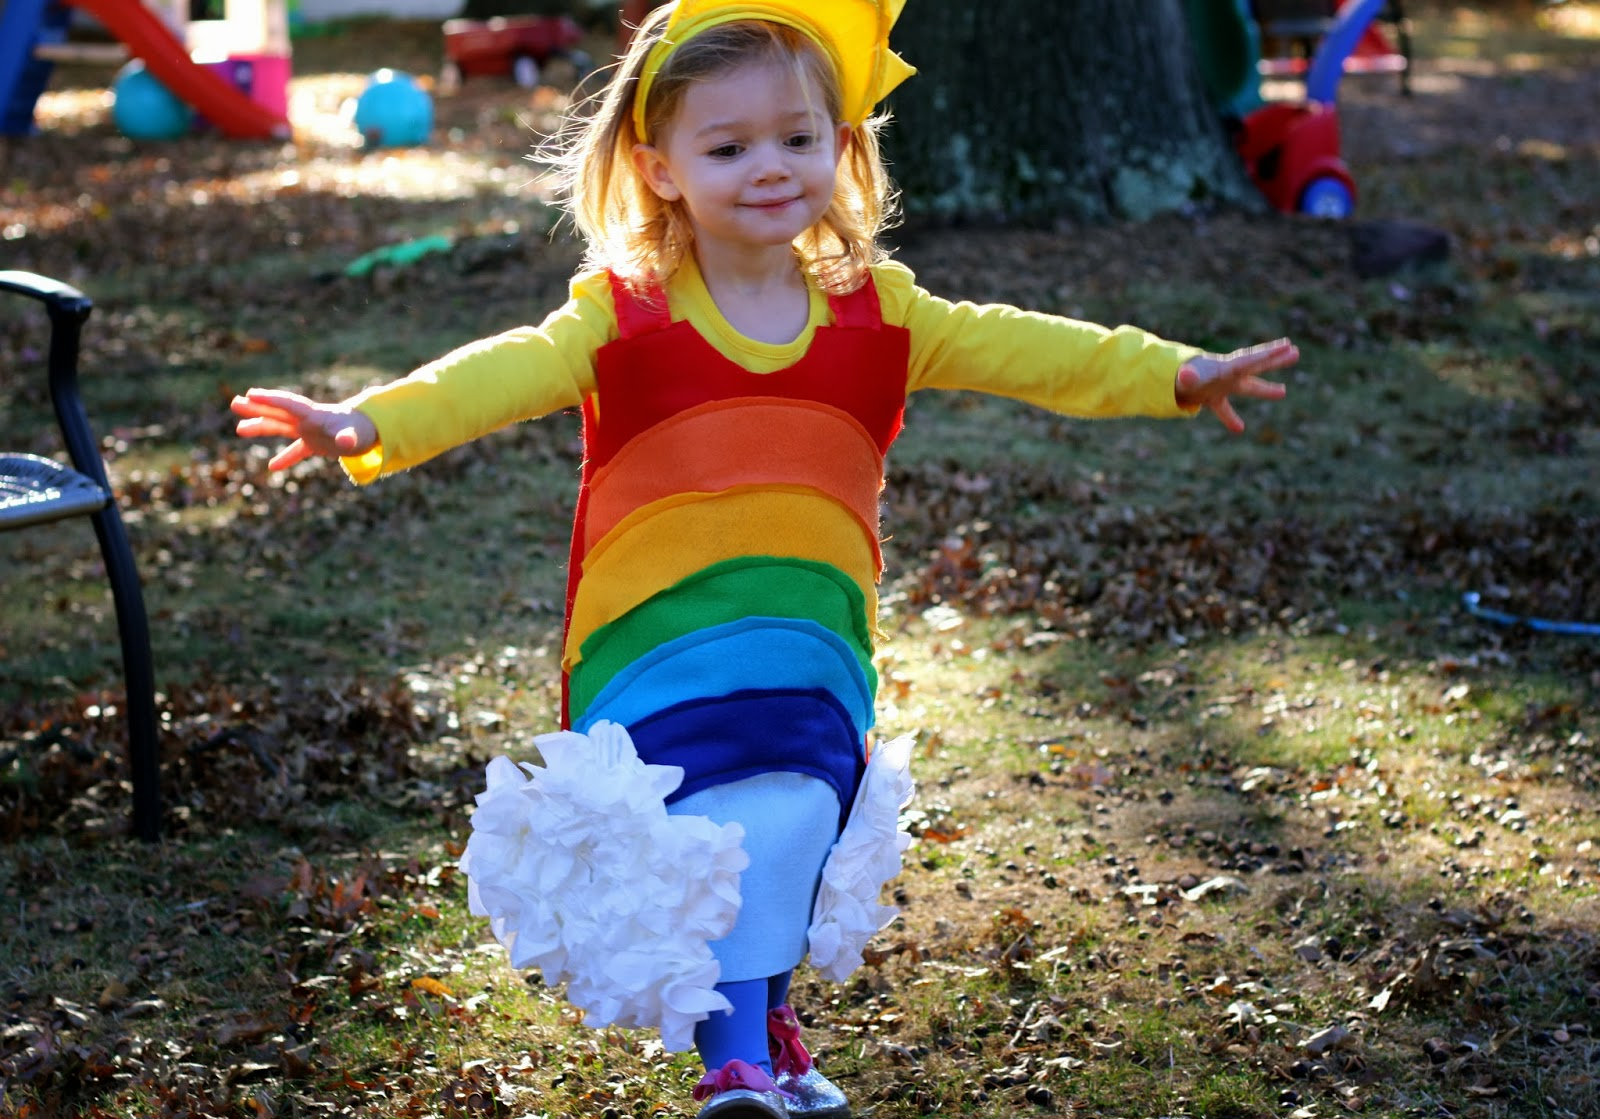 sc 1 st  The Chirping Moms & DIY Rainbow Costume - The Chirping Moms